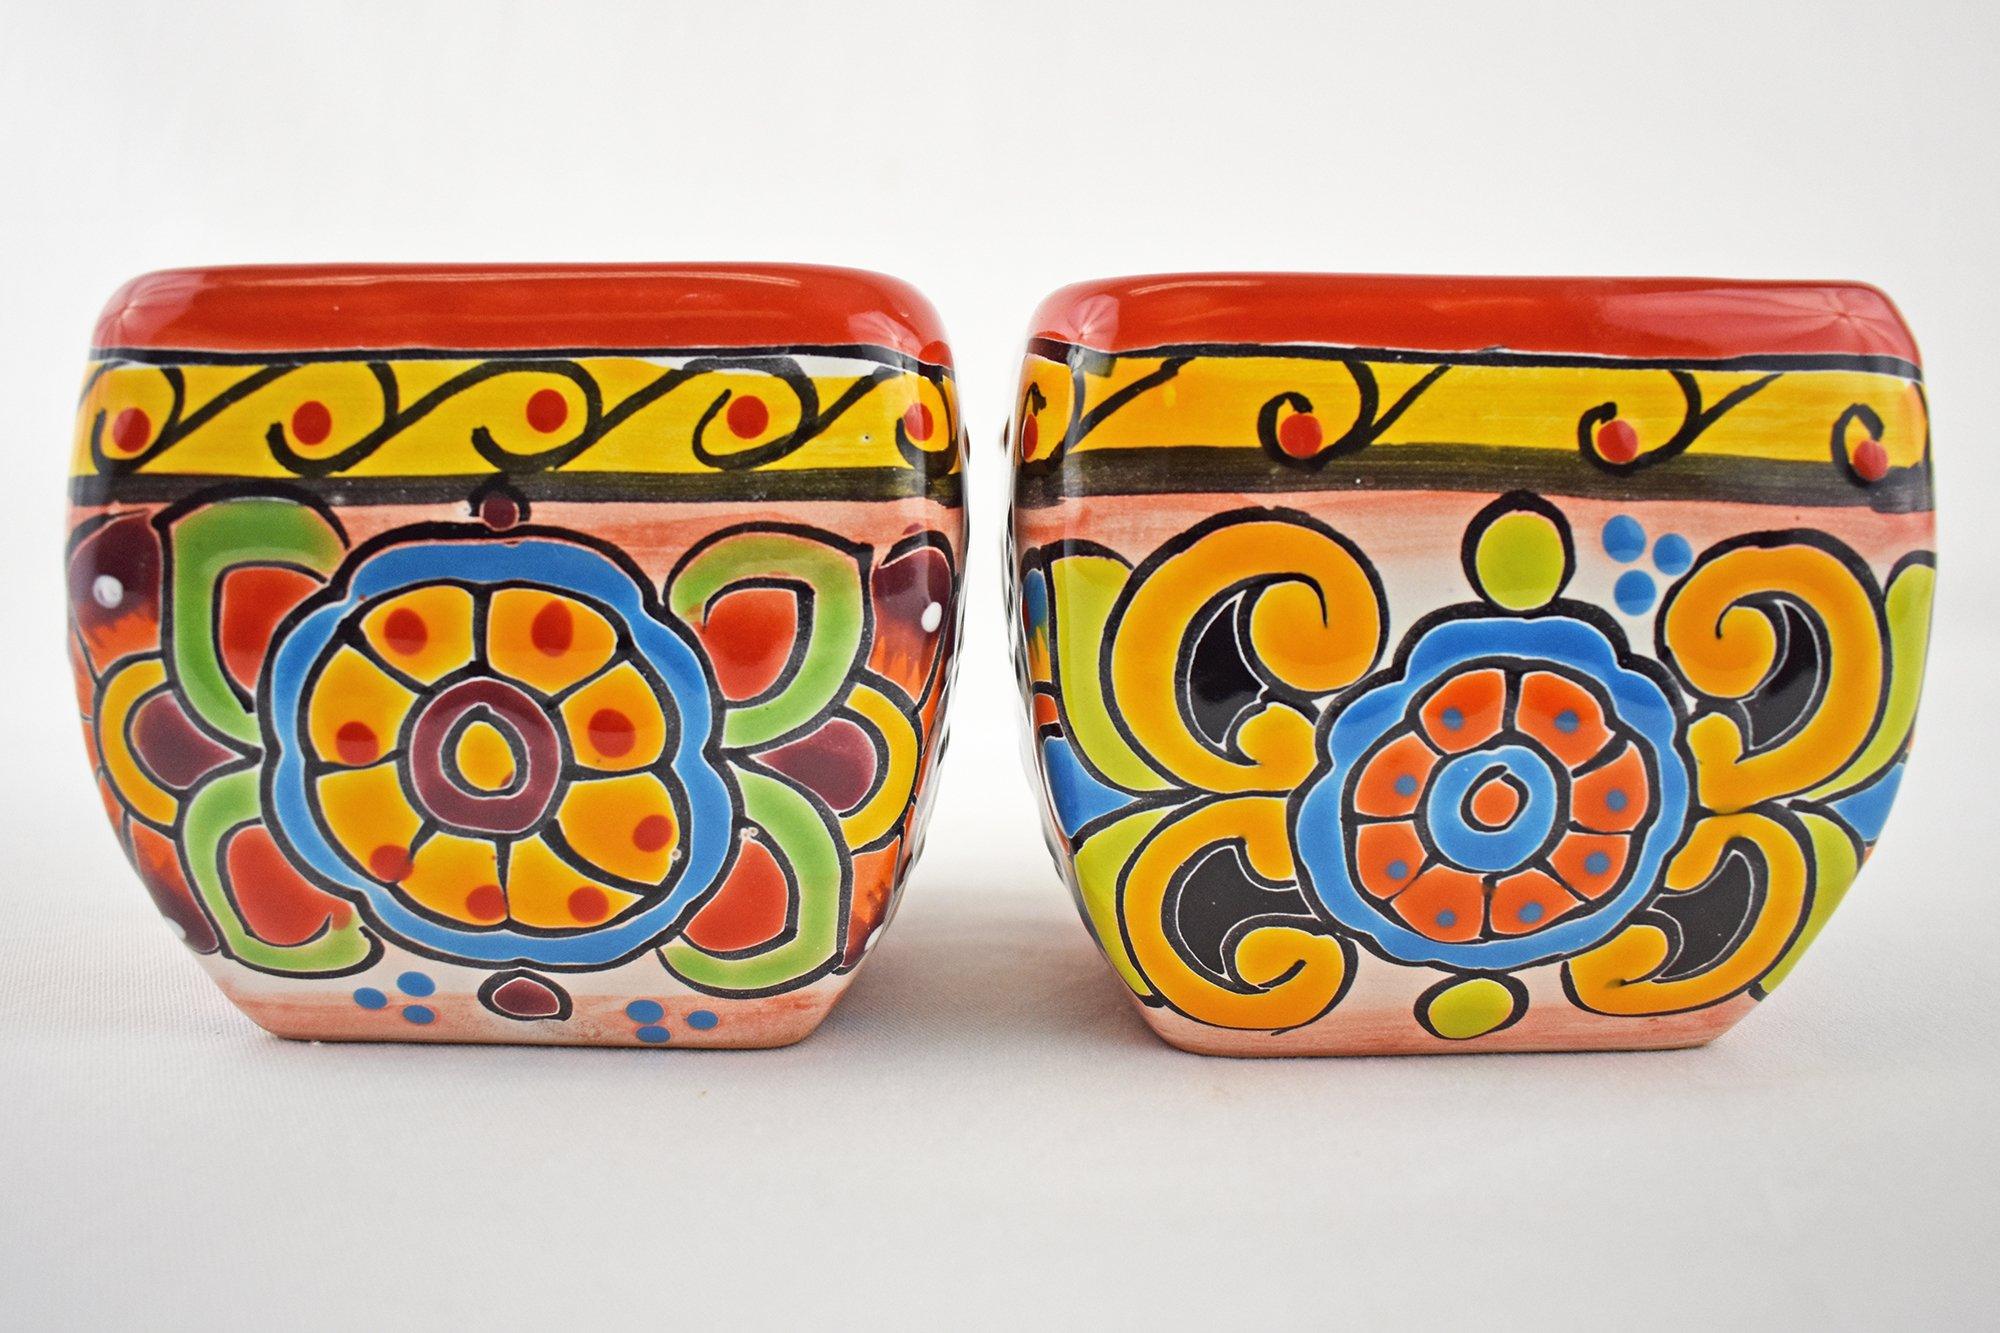 Talavera Bubble Square Set of 2 Planter Pot Hand Painted Ceramic Garden Decor (Red)